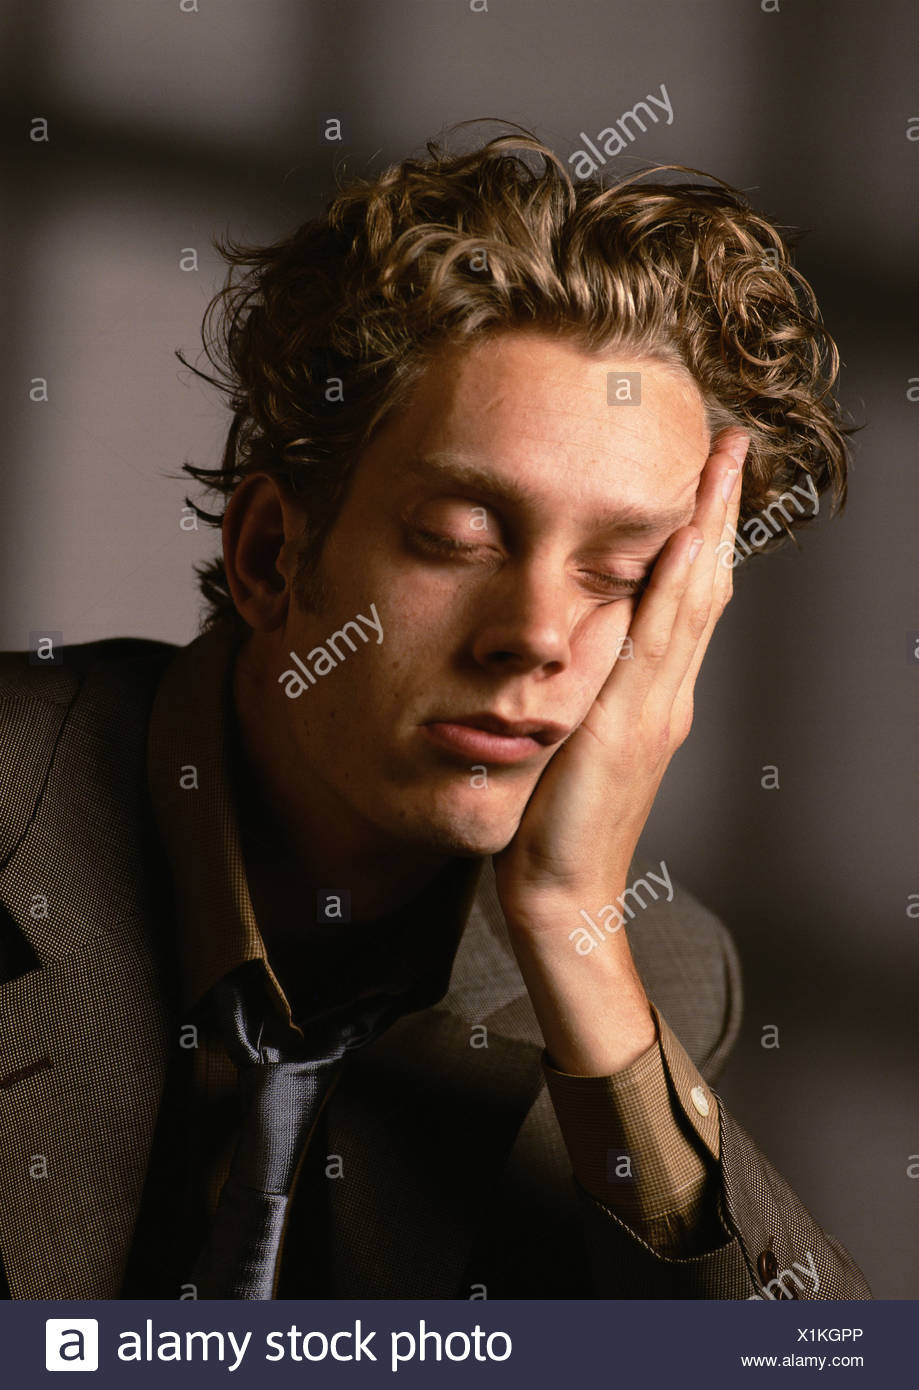 Man sleeping, head resting on hand - Stock Image